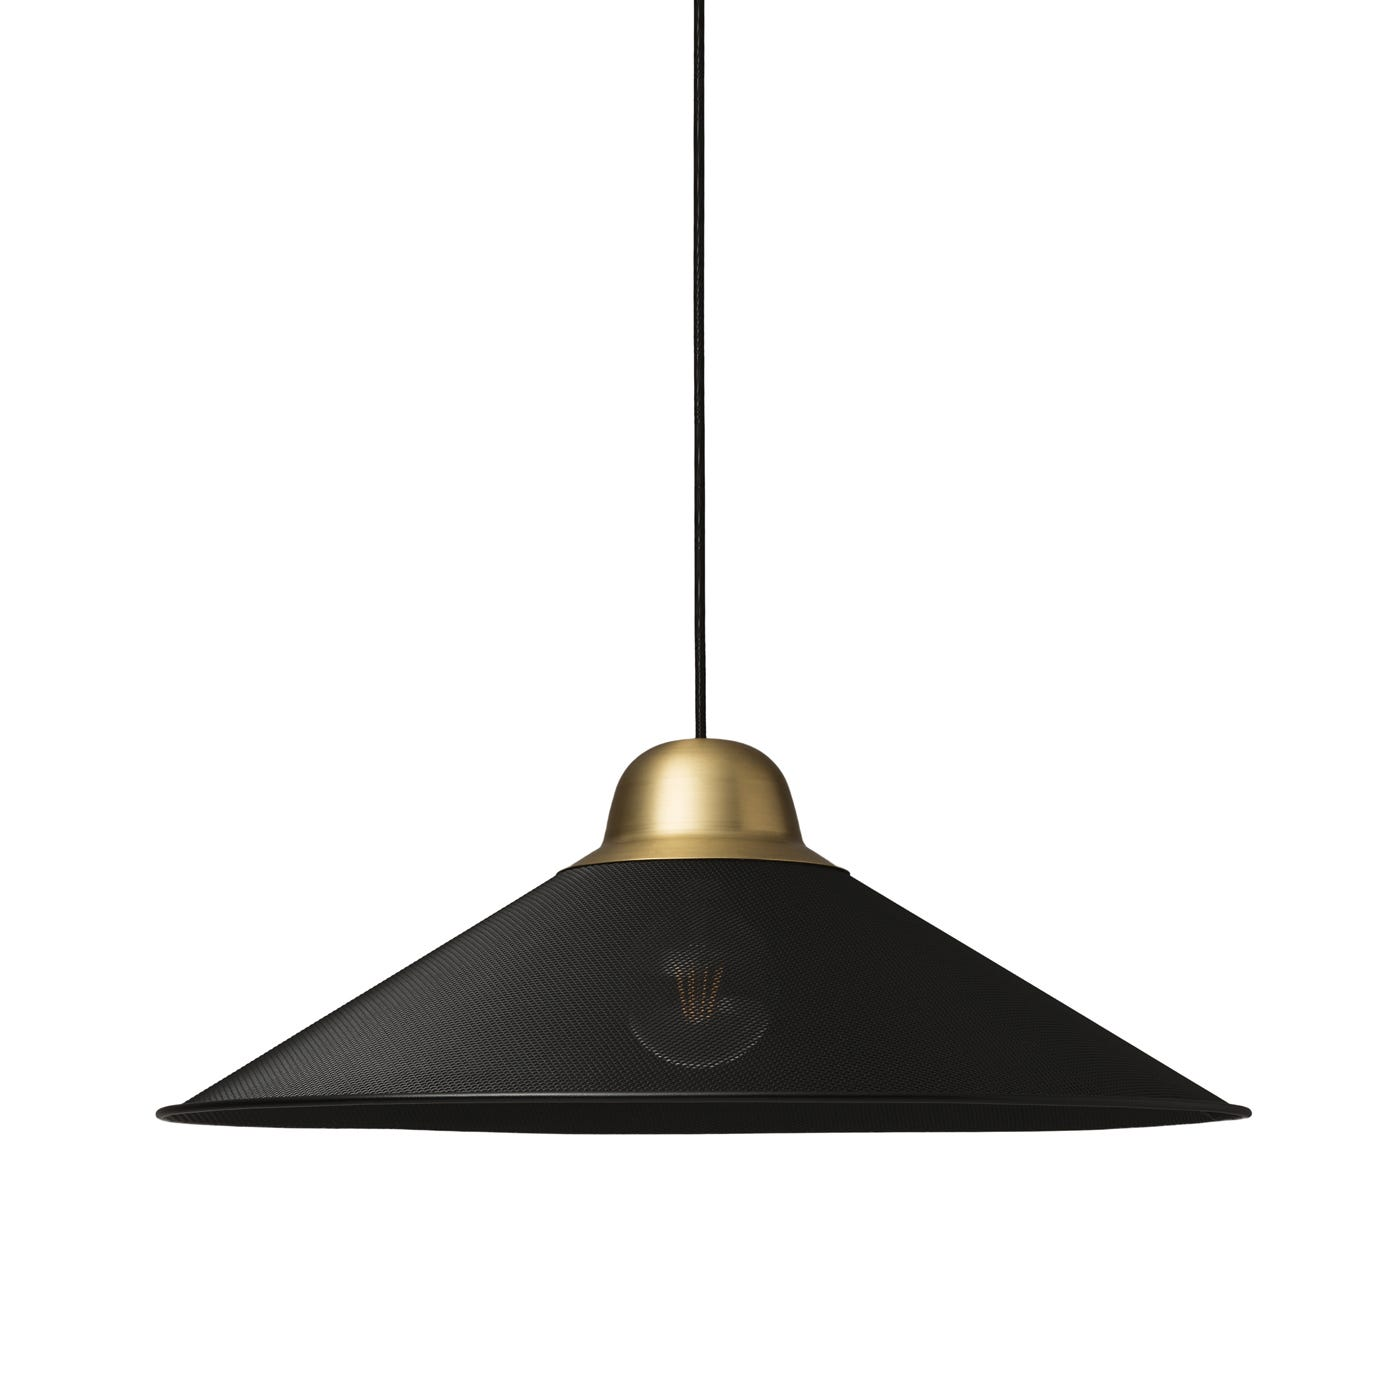 Aura Large Pendant Lamp Black/Brass -  DISC